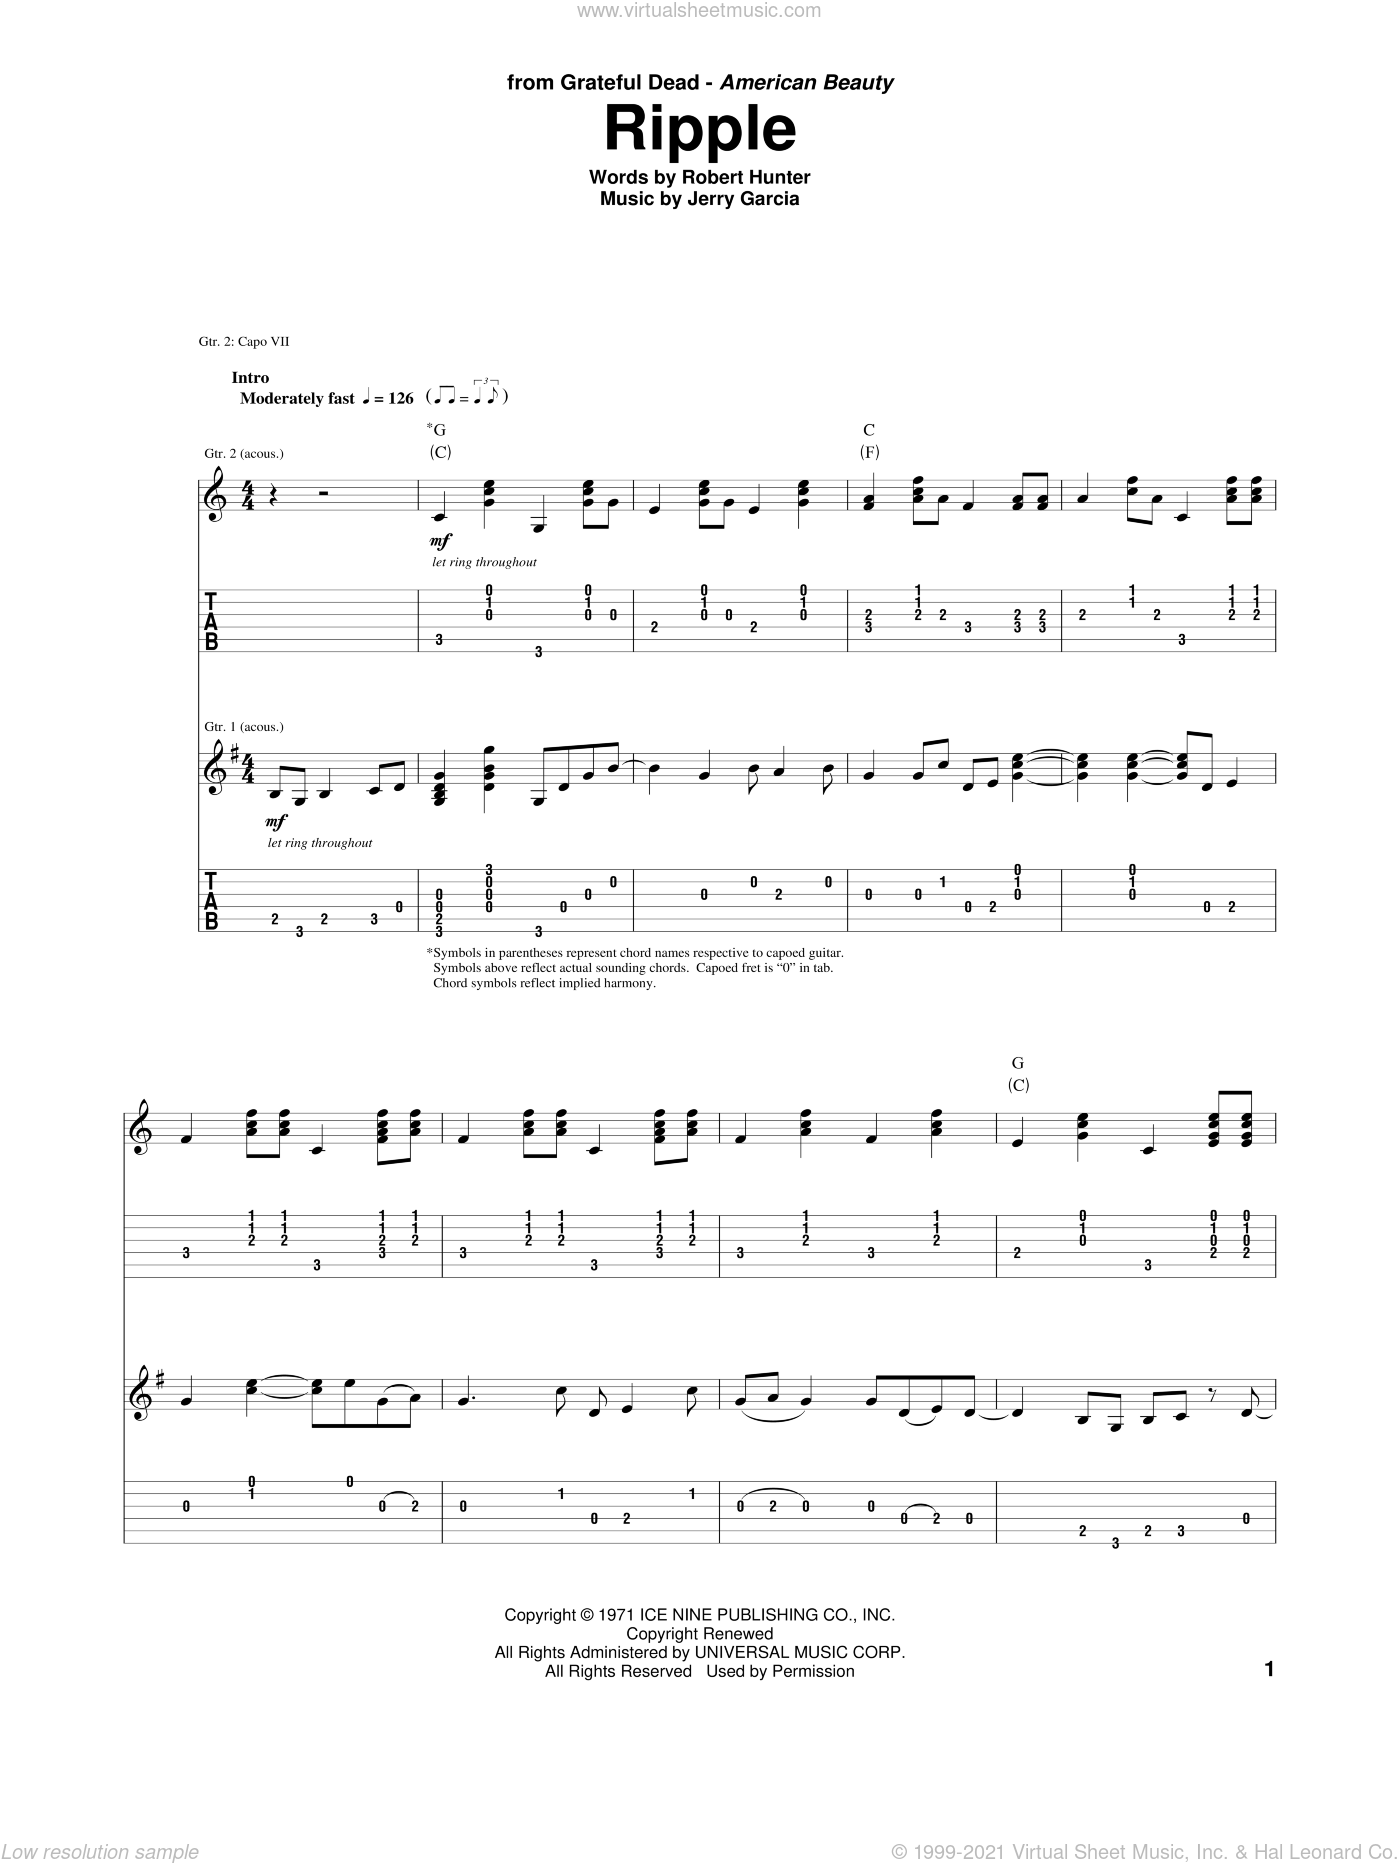 Ripple sheet music for guitar (tablature) by Grateful Dead, Jerry Garcia and Robert Hunter, intermediate skill level